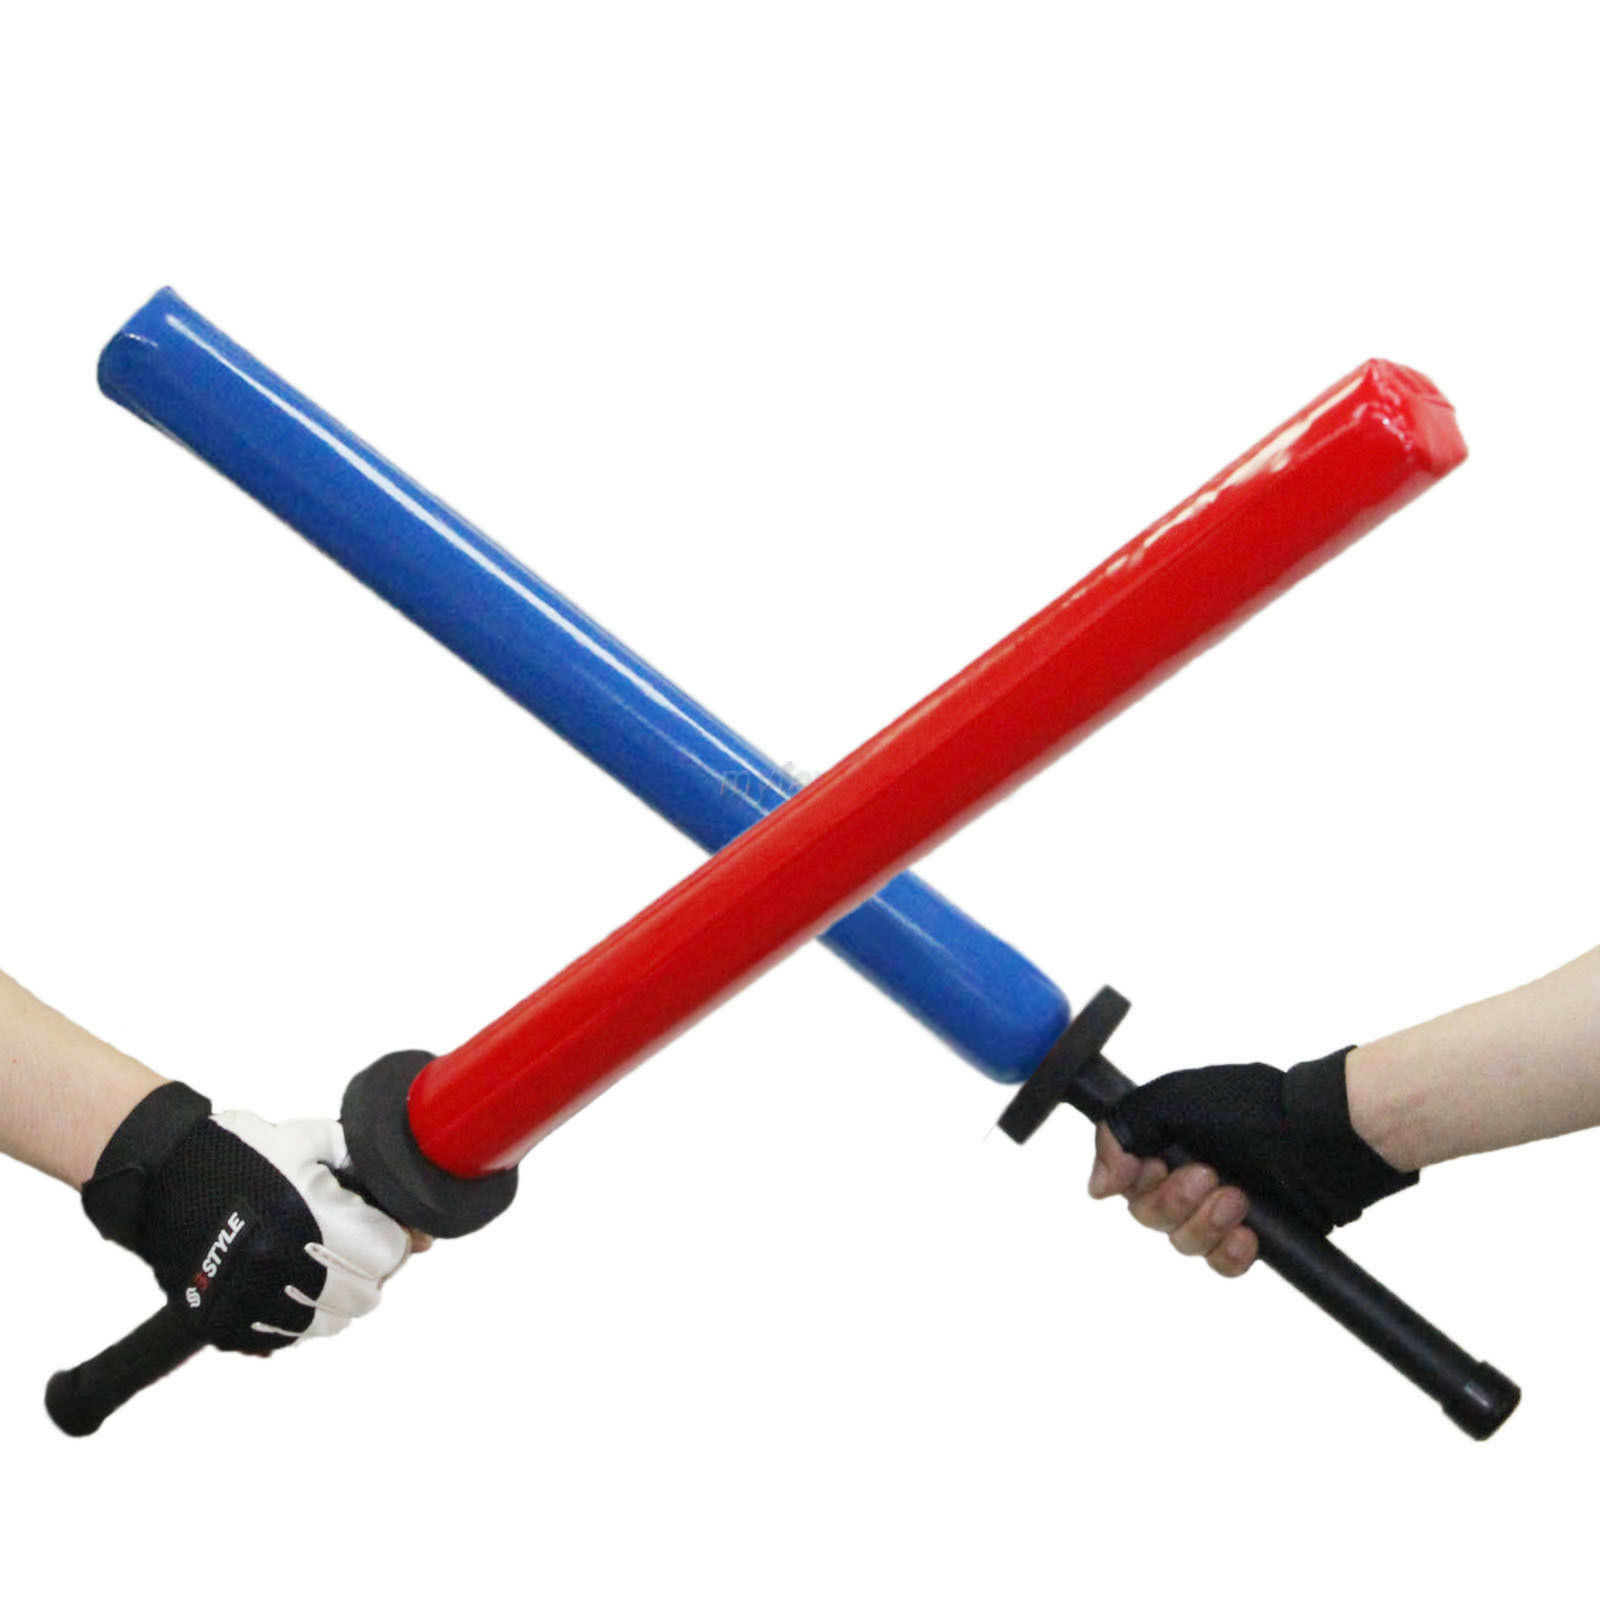 Sponge Swords Foam Sticks 80cm 2pcs Set Chanbara Fighting Sparring Cudgel Kendo